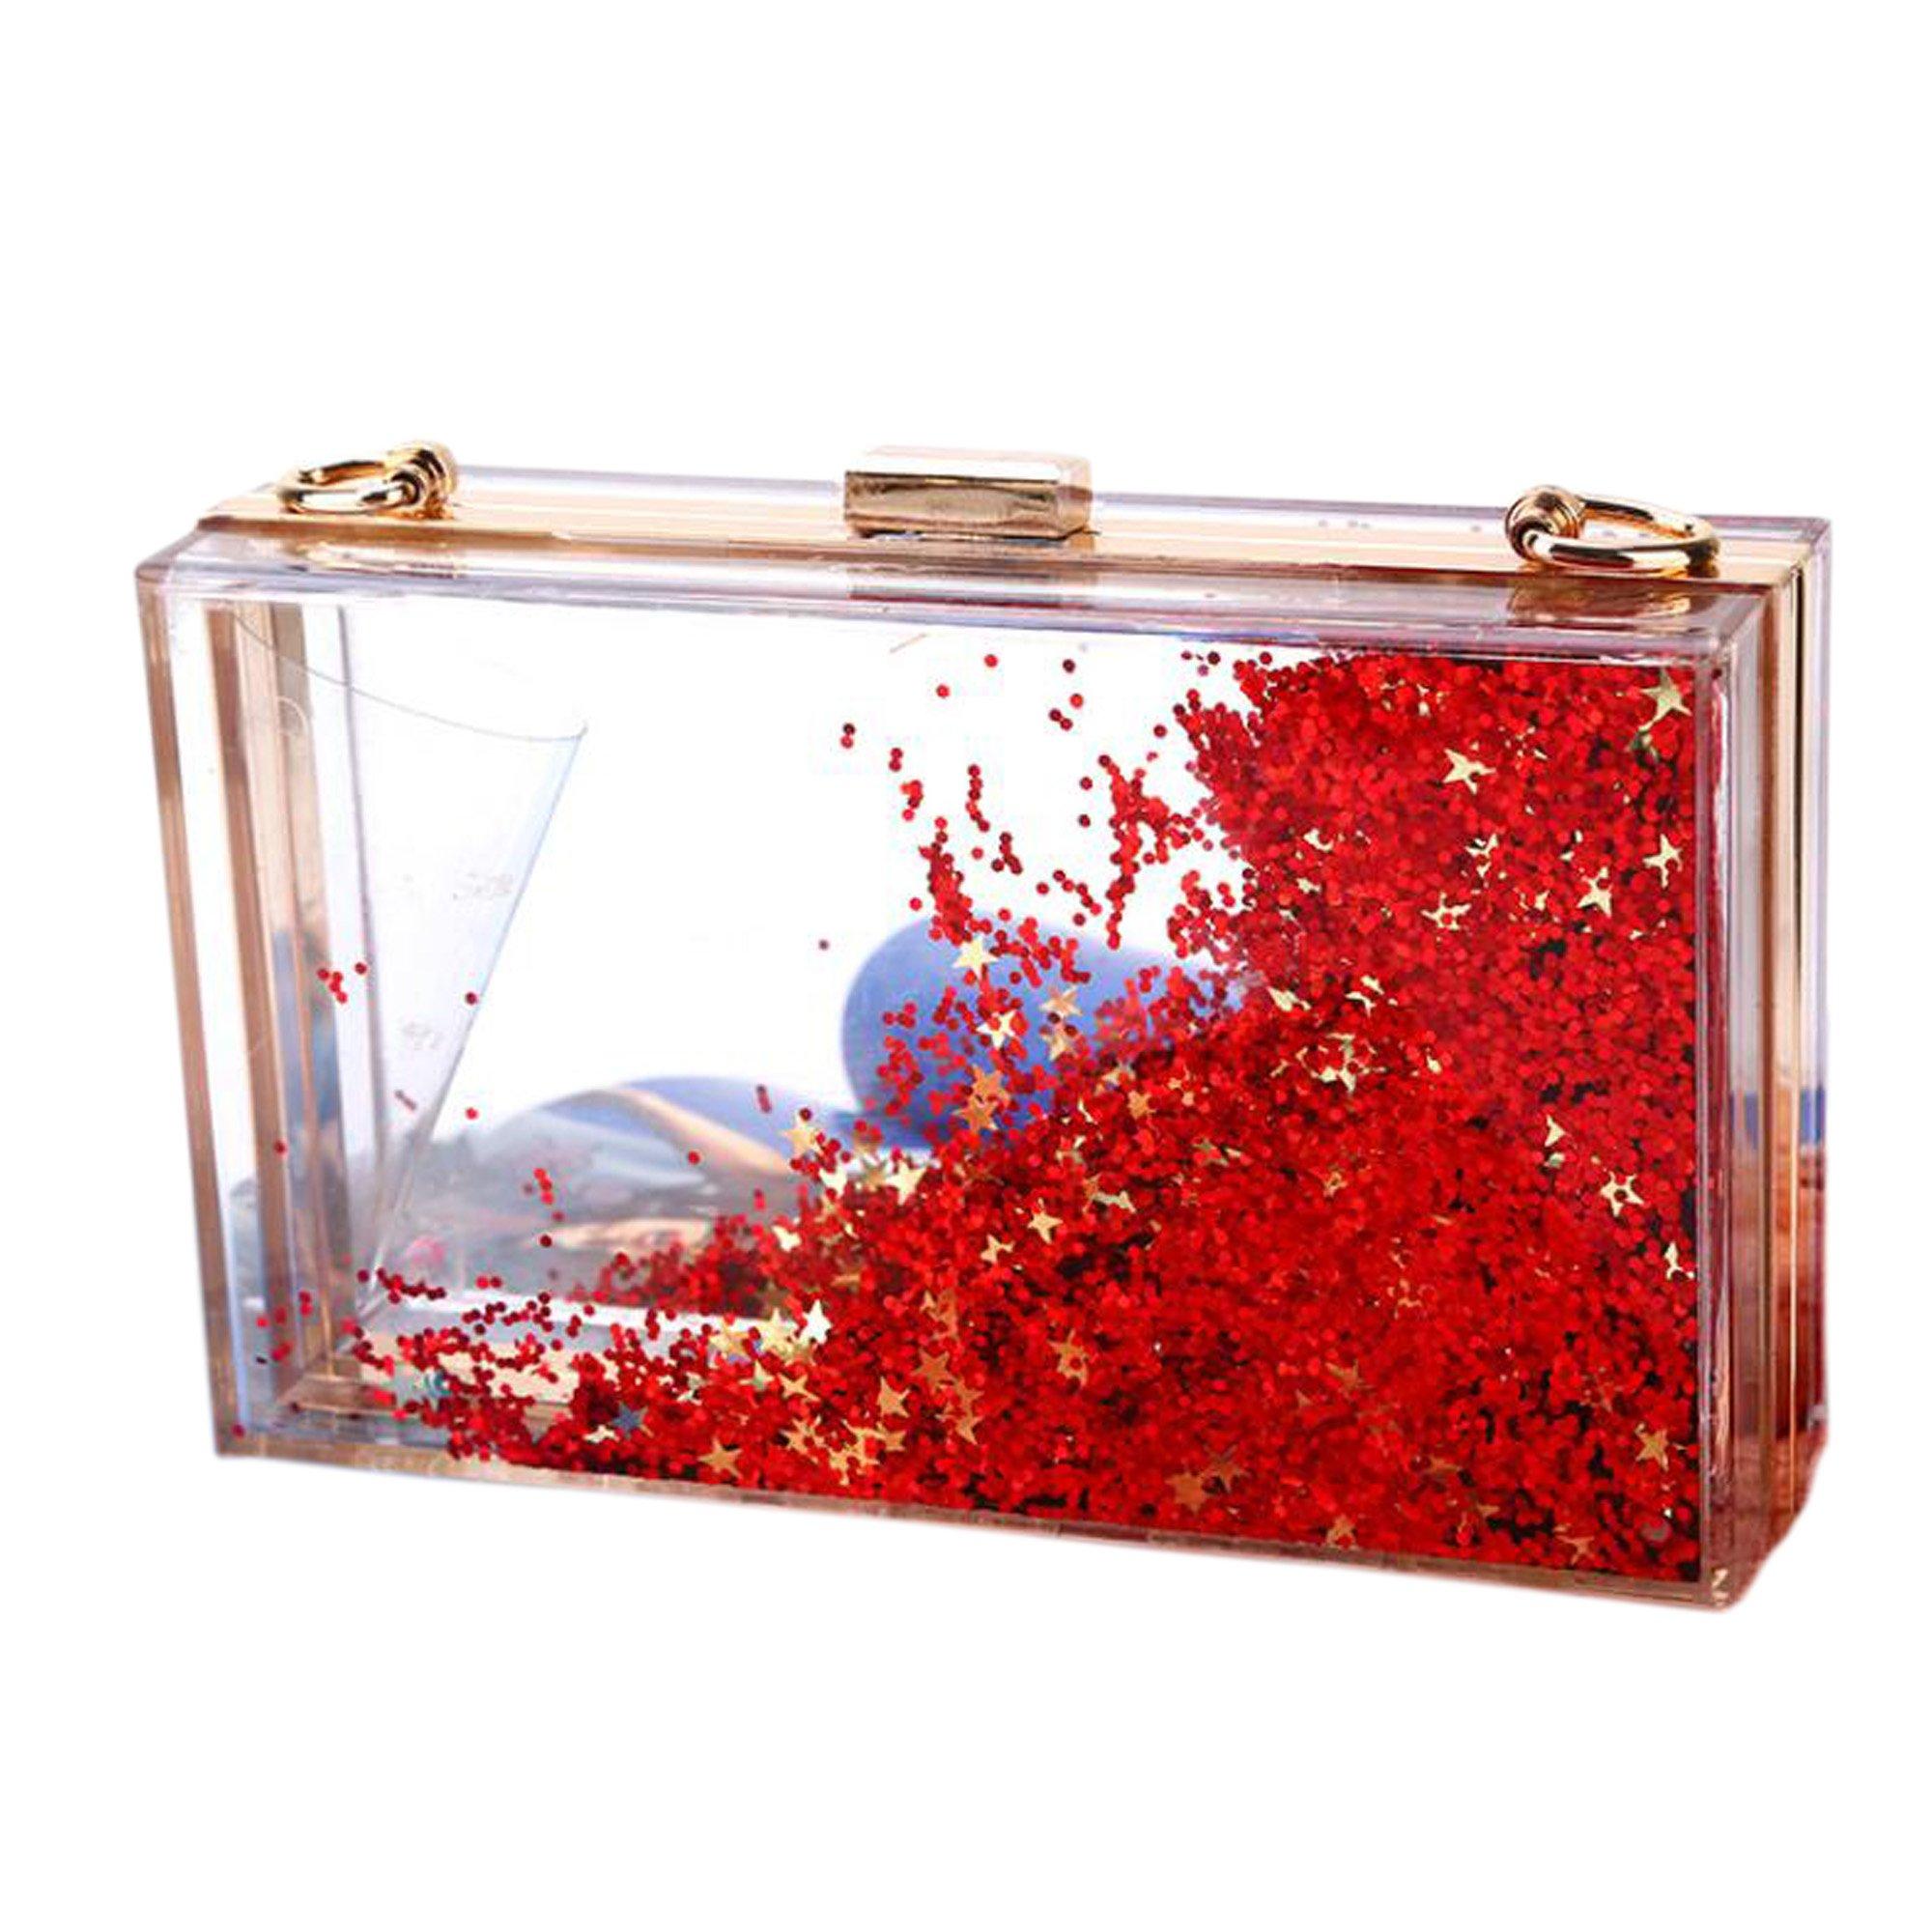 Women Girls Evening Party Acrylic Transparent Glitter Sequins Clutch Box Purse Bag Wedding Handbags (red)